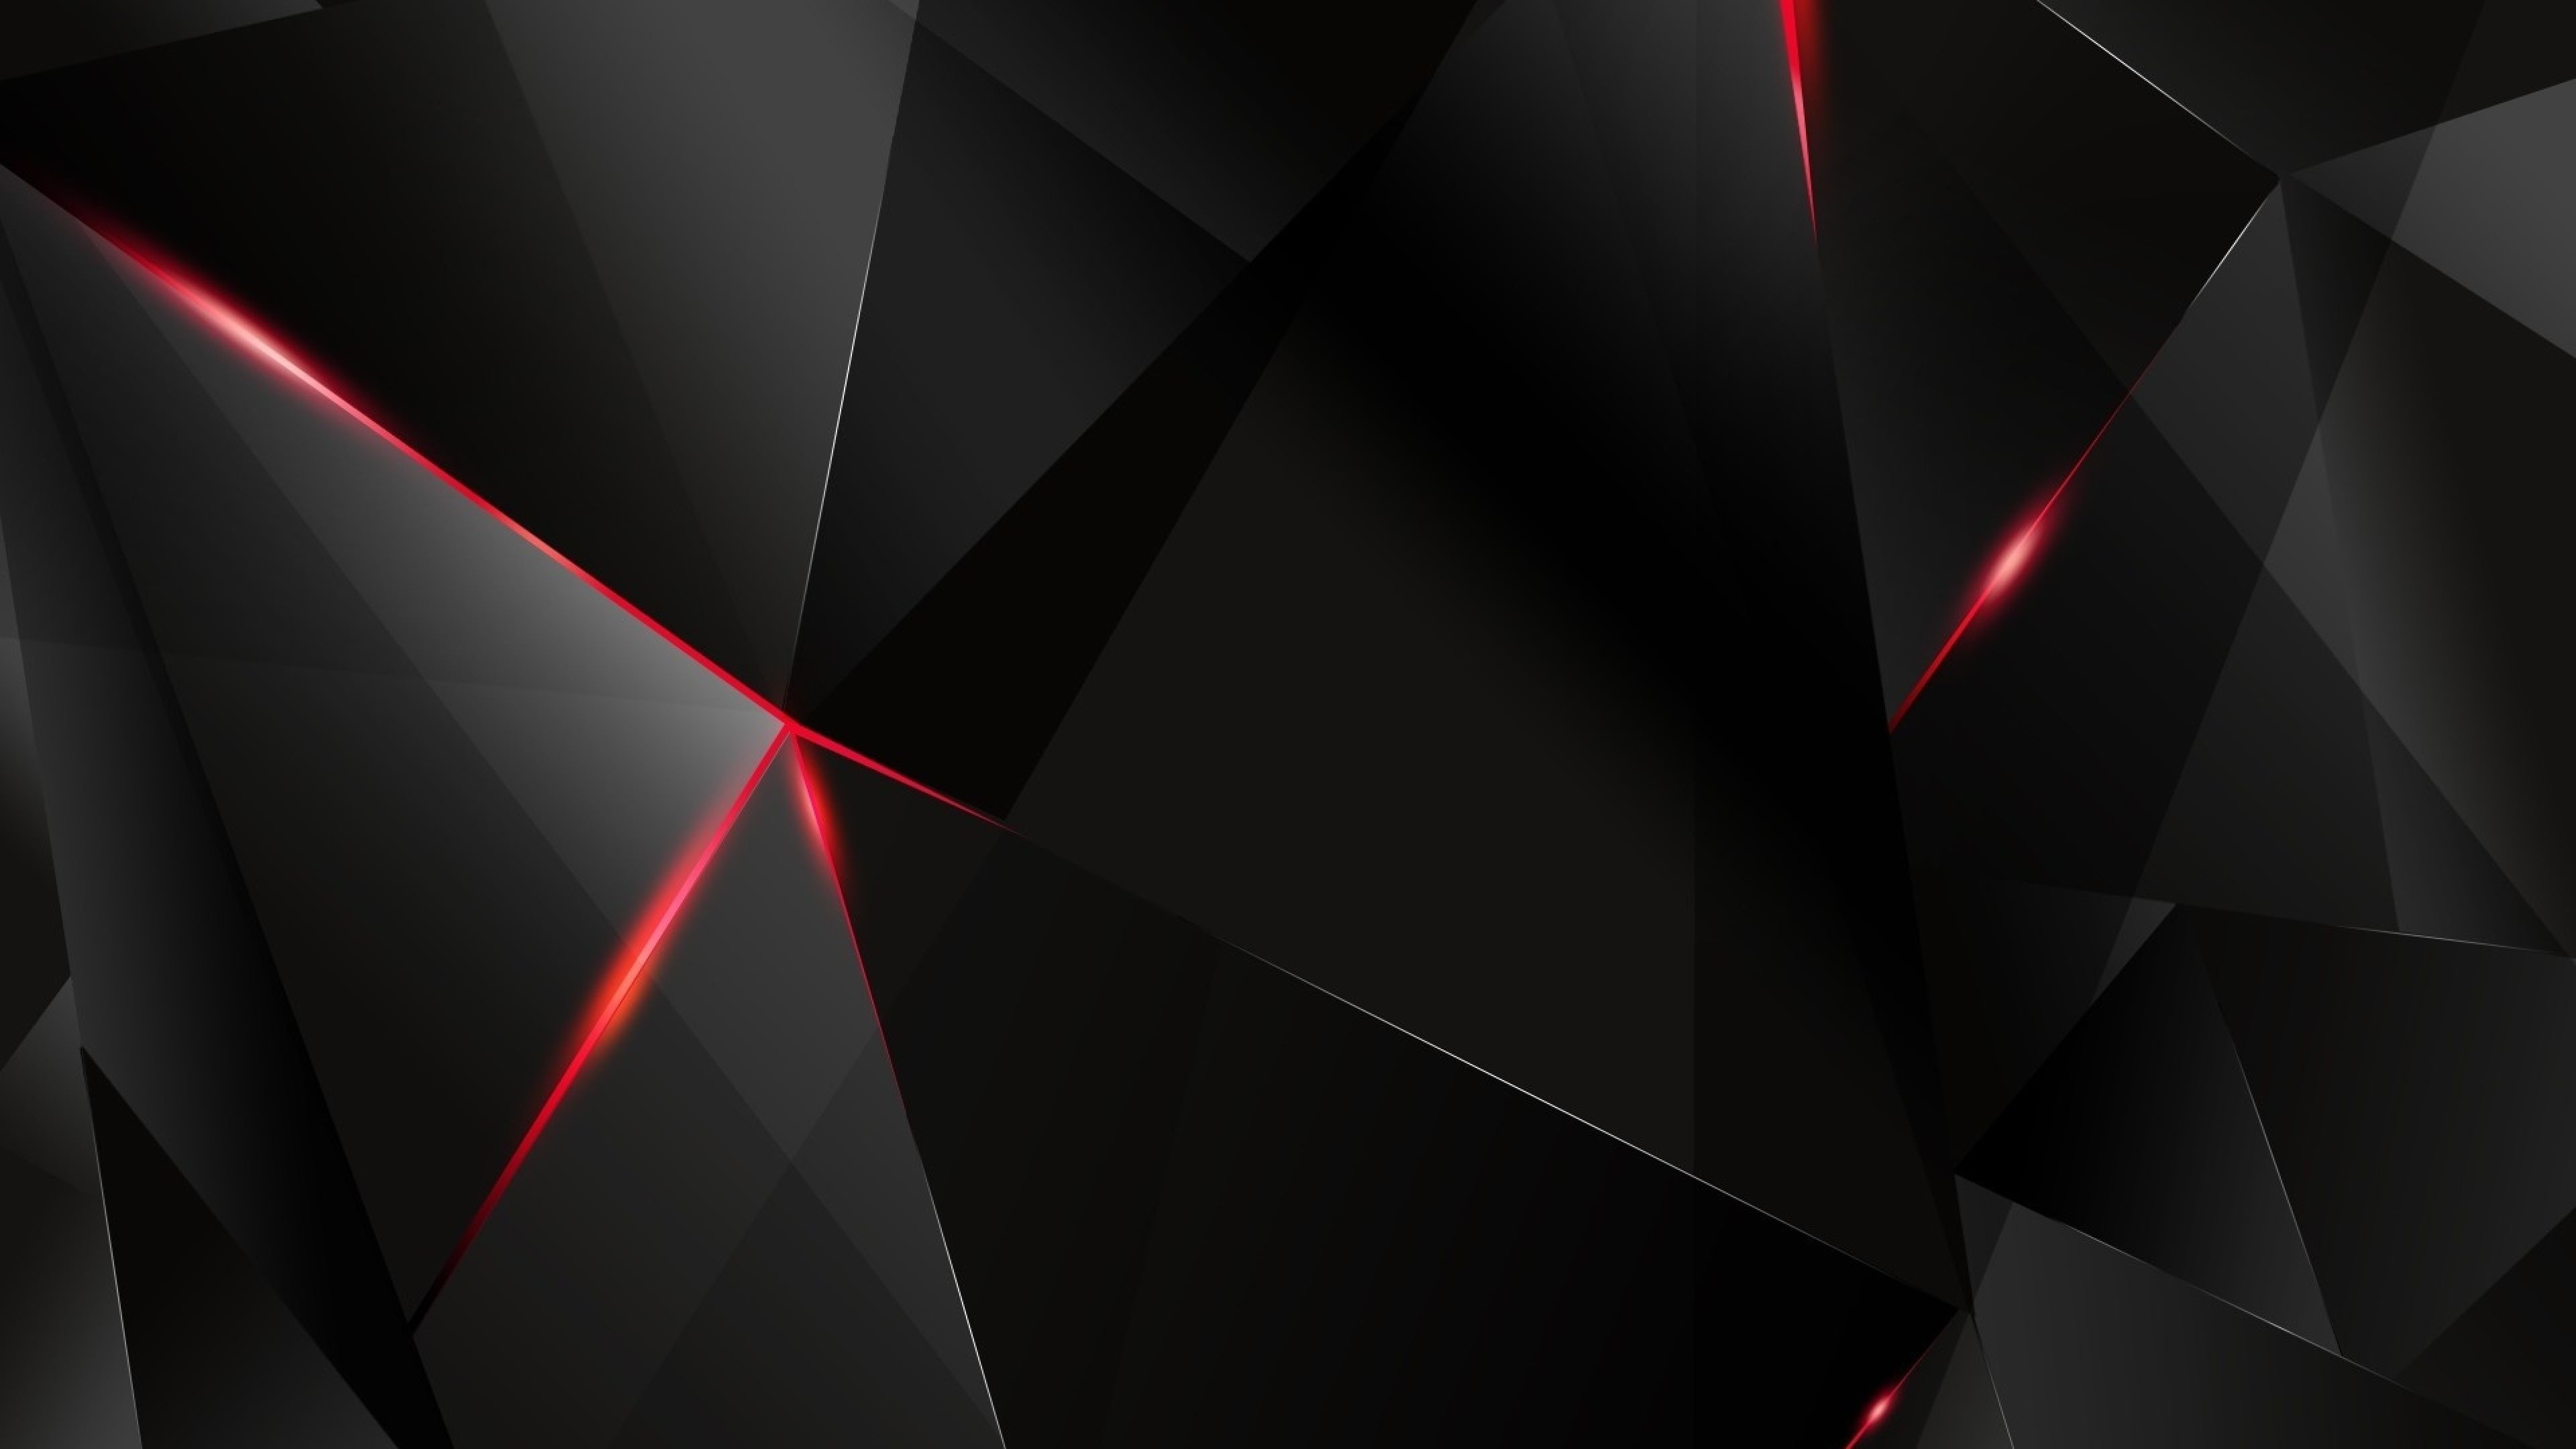 Black Red Wallpaper 4k 10367 Hd Wallpaper Backgrounds Download